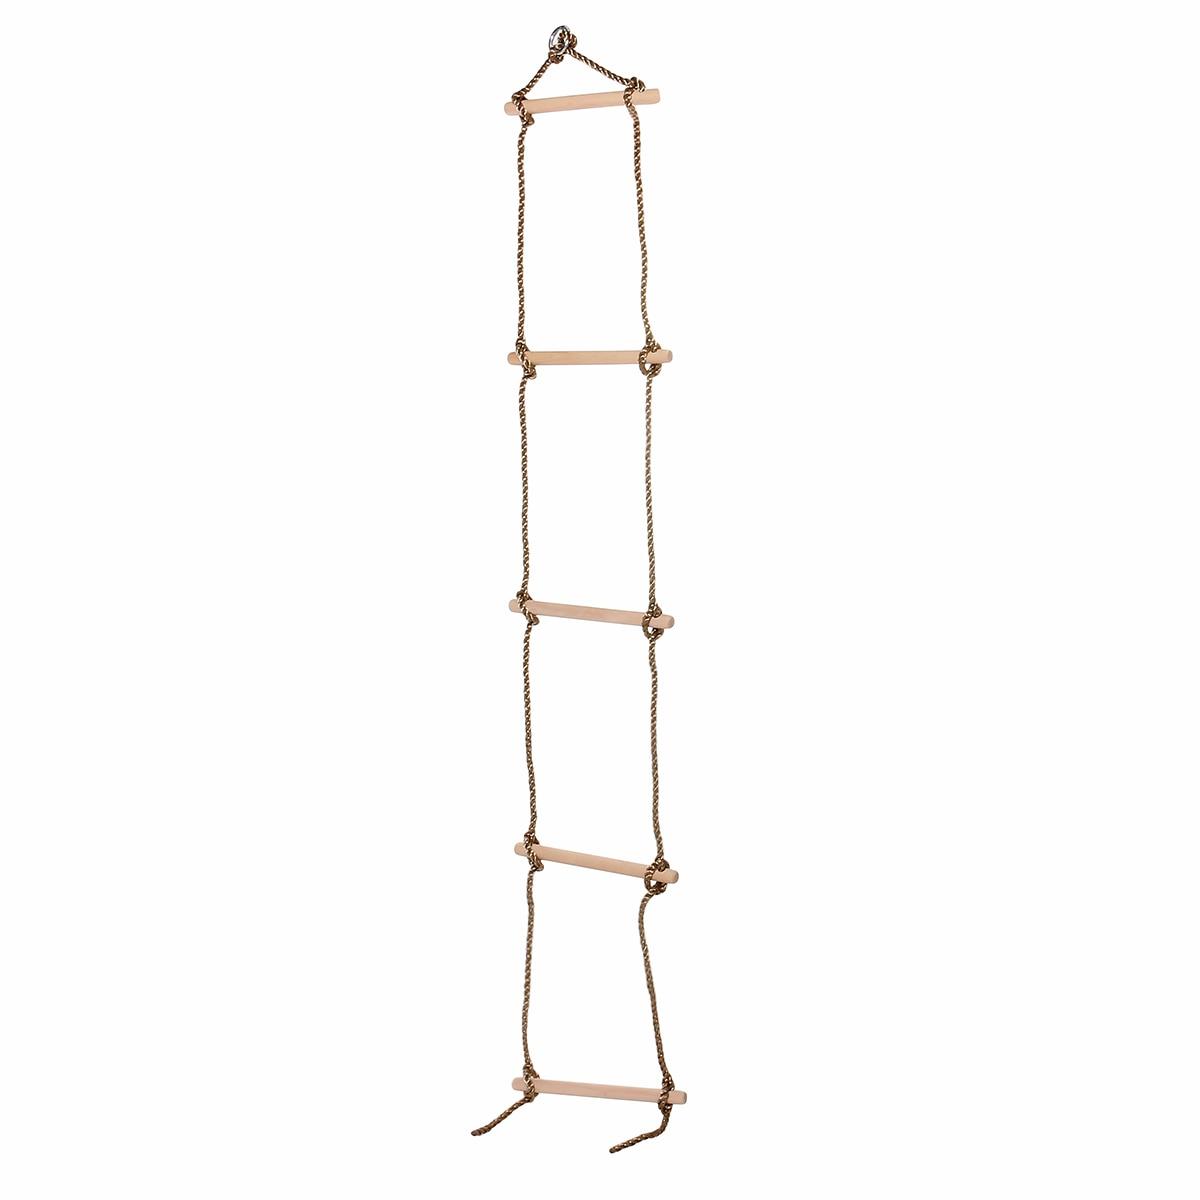 5 Wooden Rungs PE Rope Ladder Children Climbing Toy Kids Sport Rope Swing Safe Fitness Toys Equipment Indoor Outdoor Garden